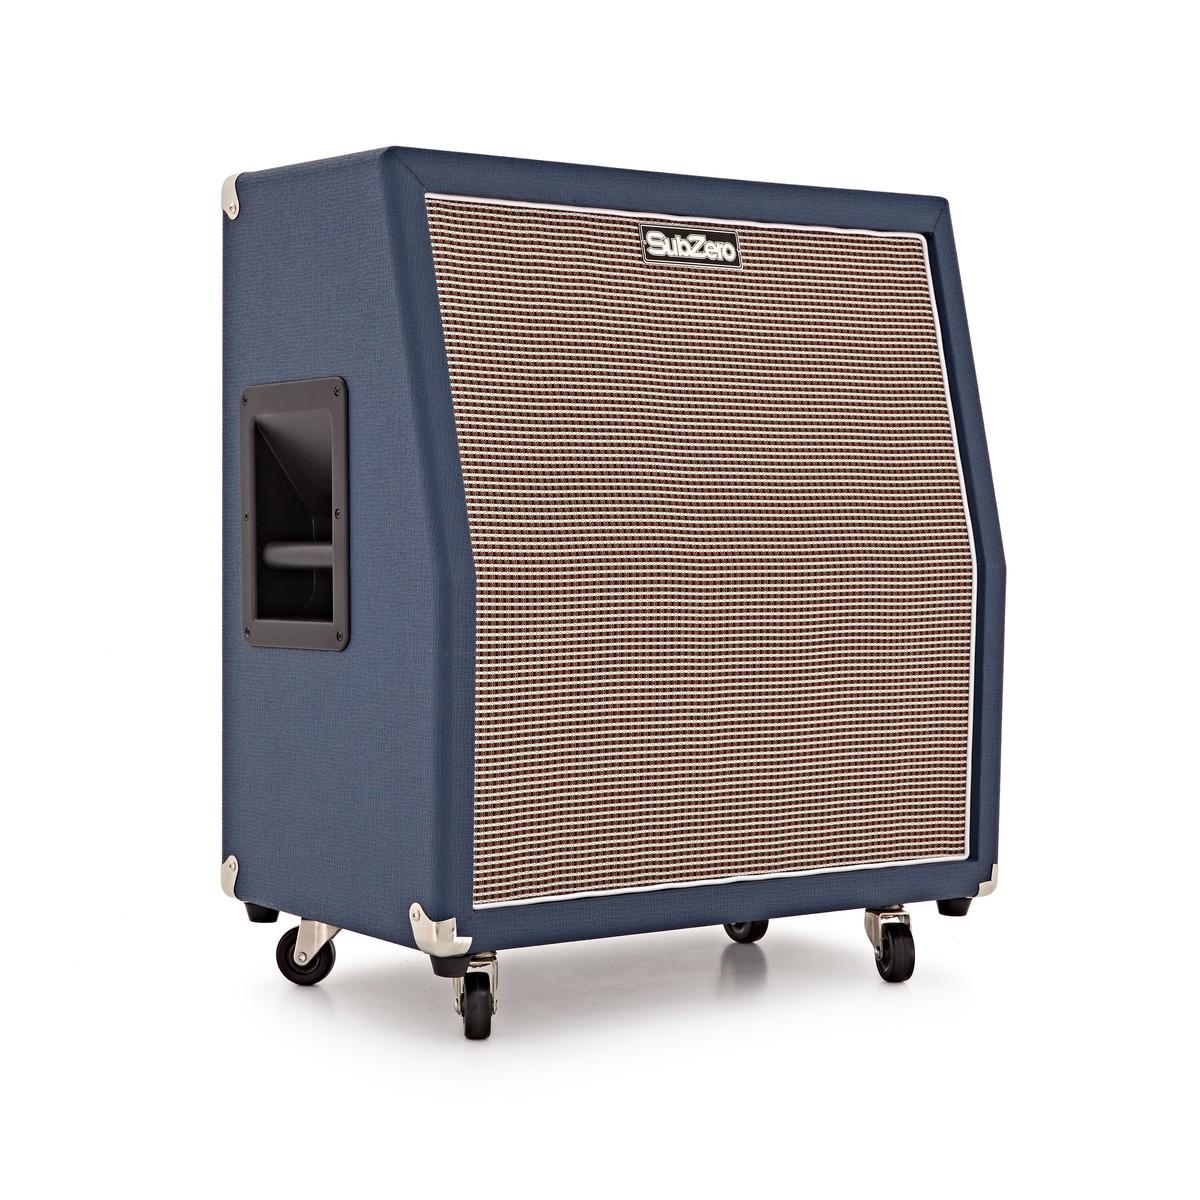 subzero g410 4 x 10 celestion speaker cabinet at gear4music. Black Bedroom Furniture Sets. Home Design Ideas